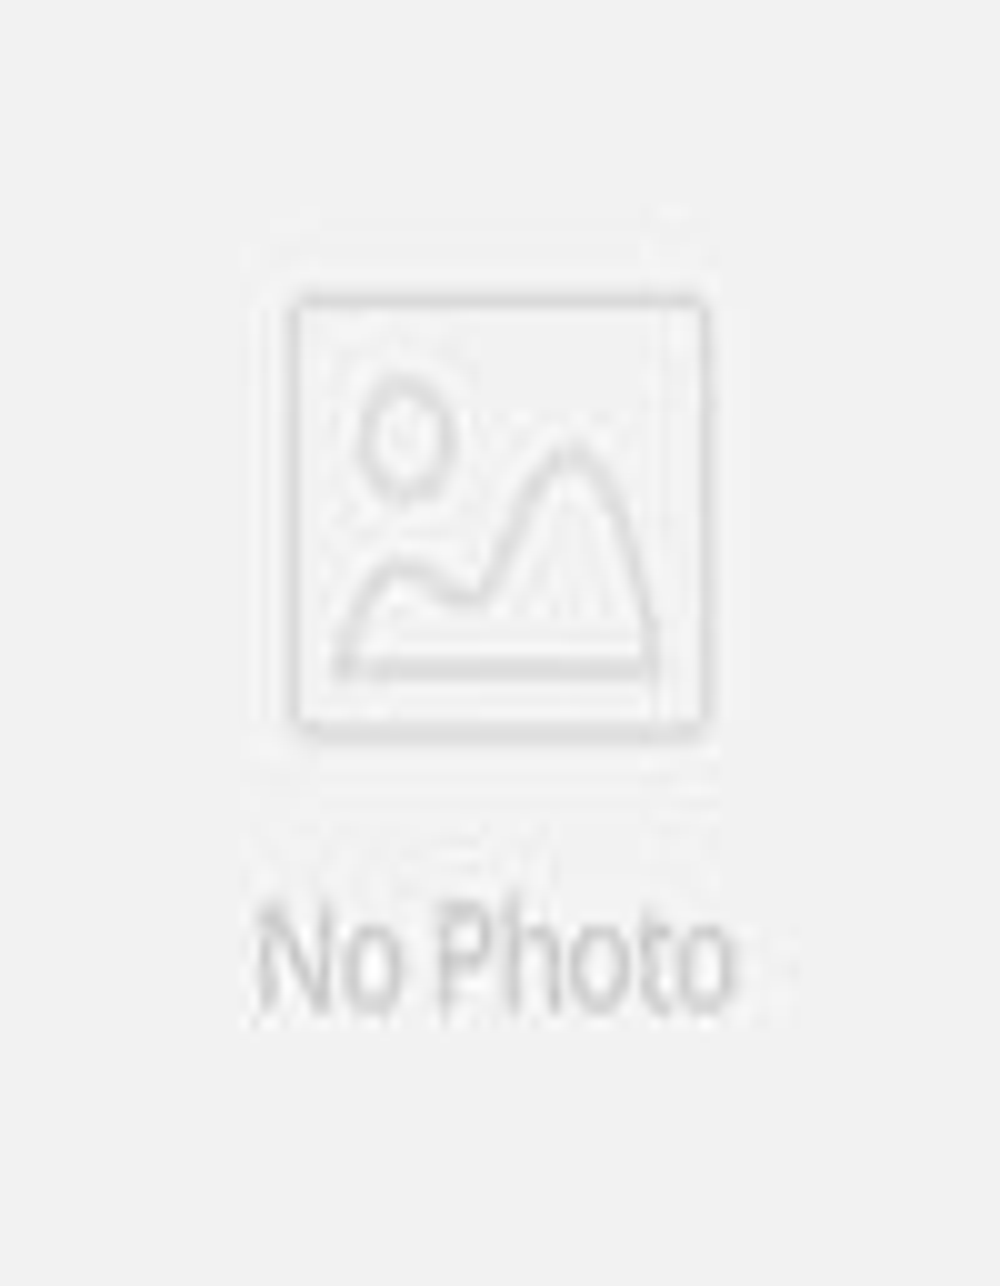 2013 aolover woman wild lace Garter 19